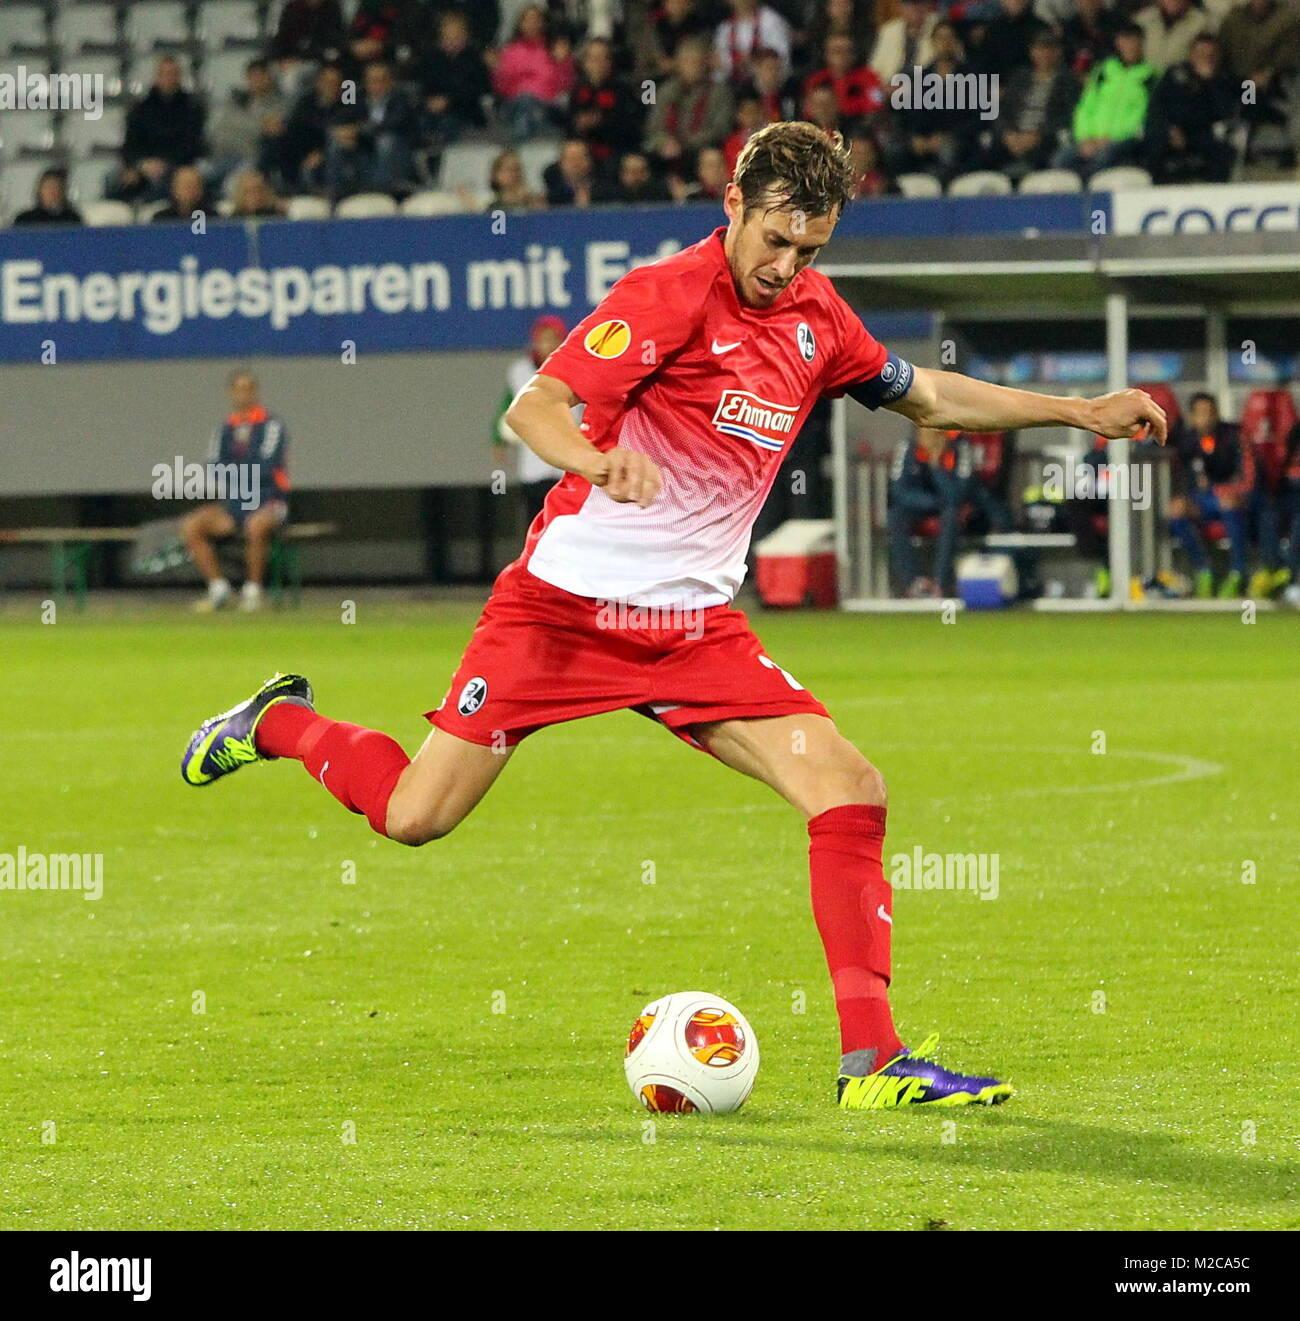 Julian Schuster, Kapitän des SC Freiburg am Ball - Fussball-Europa-League: 3. Spieltag, SC Freiburg vs. Estoril - Stock Image